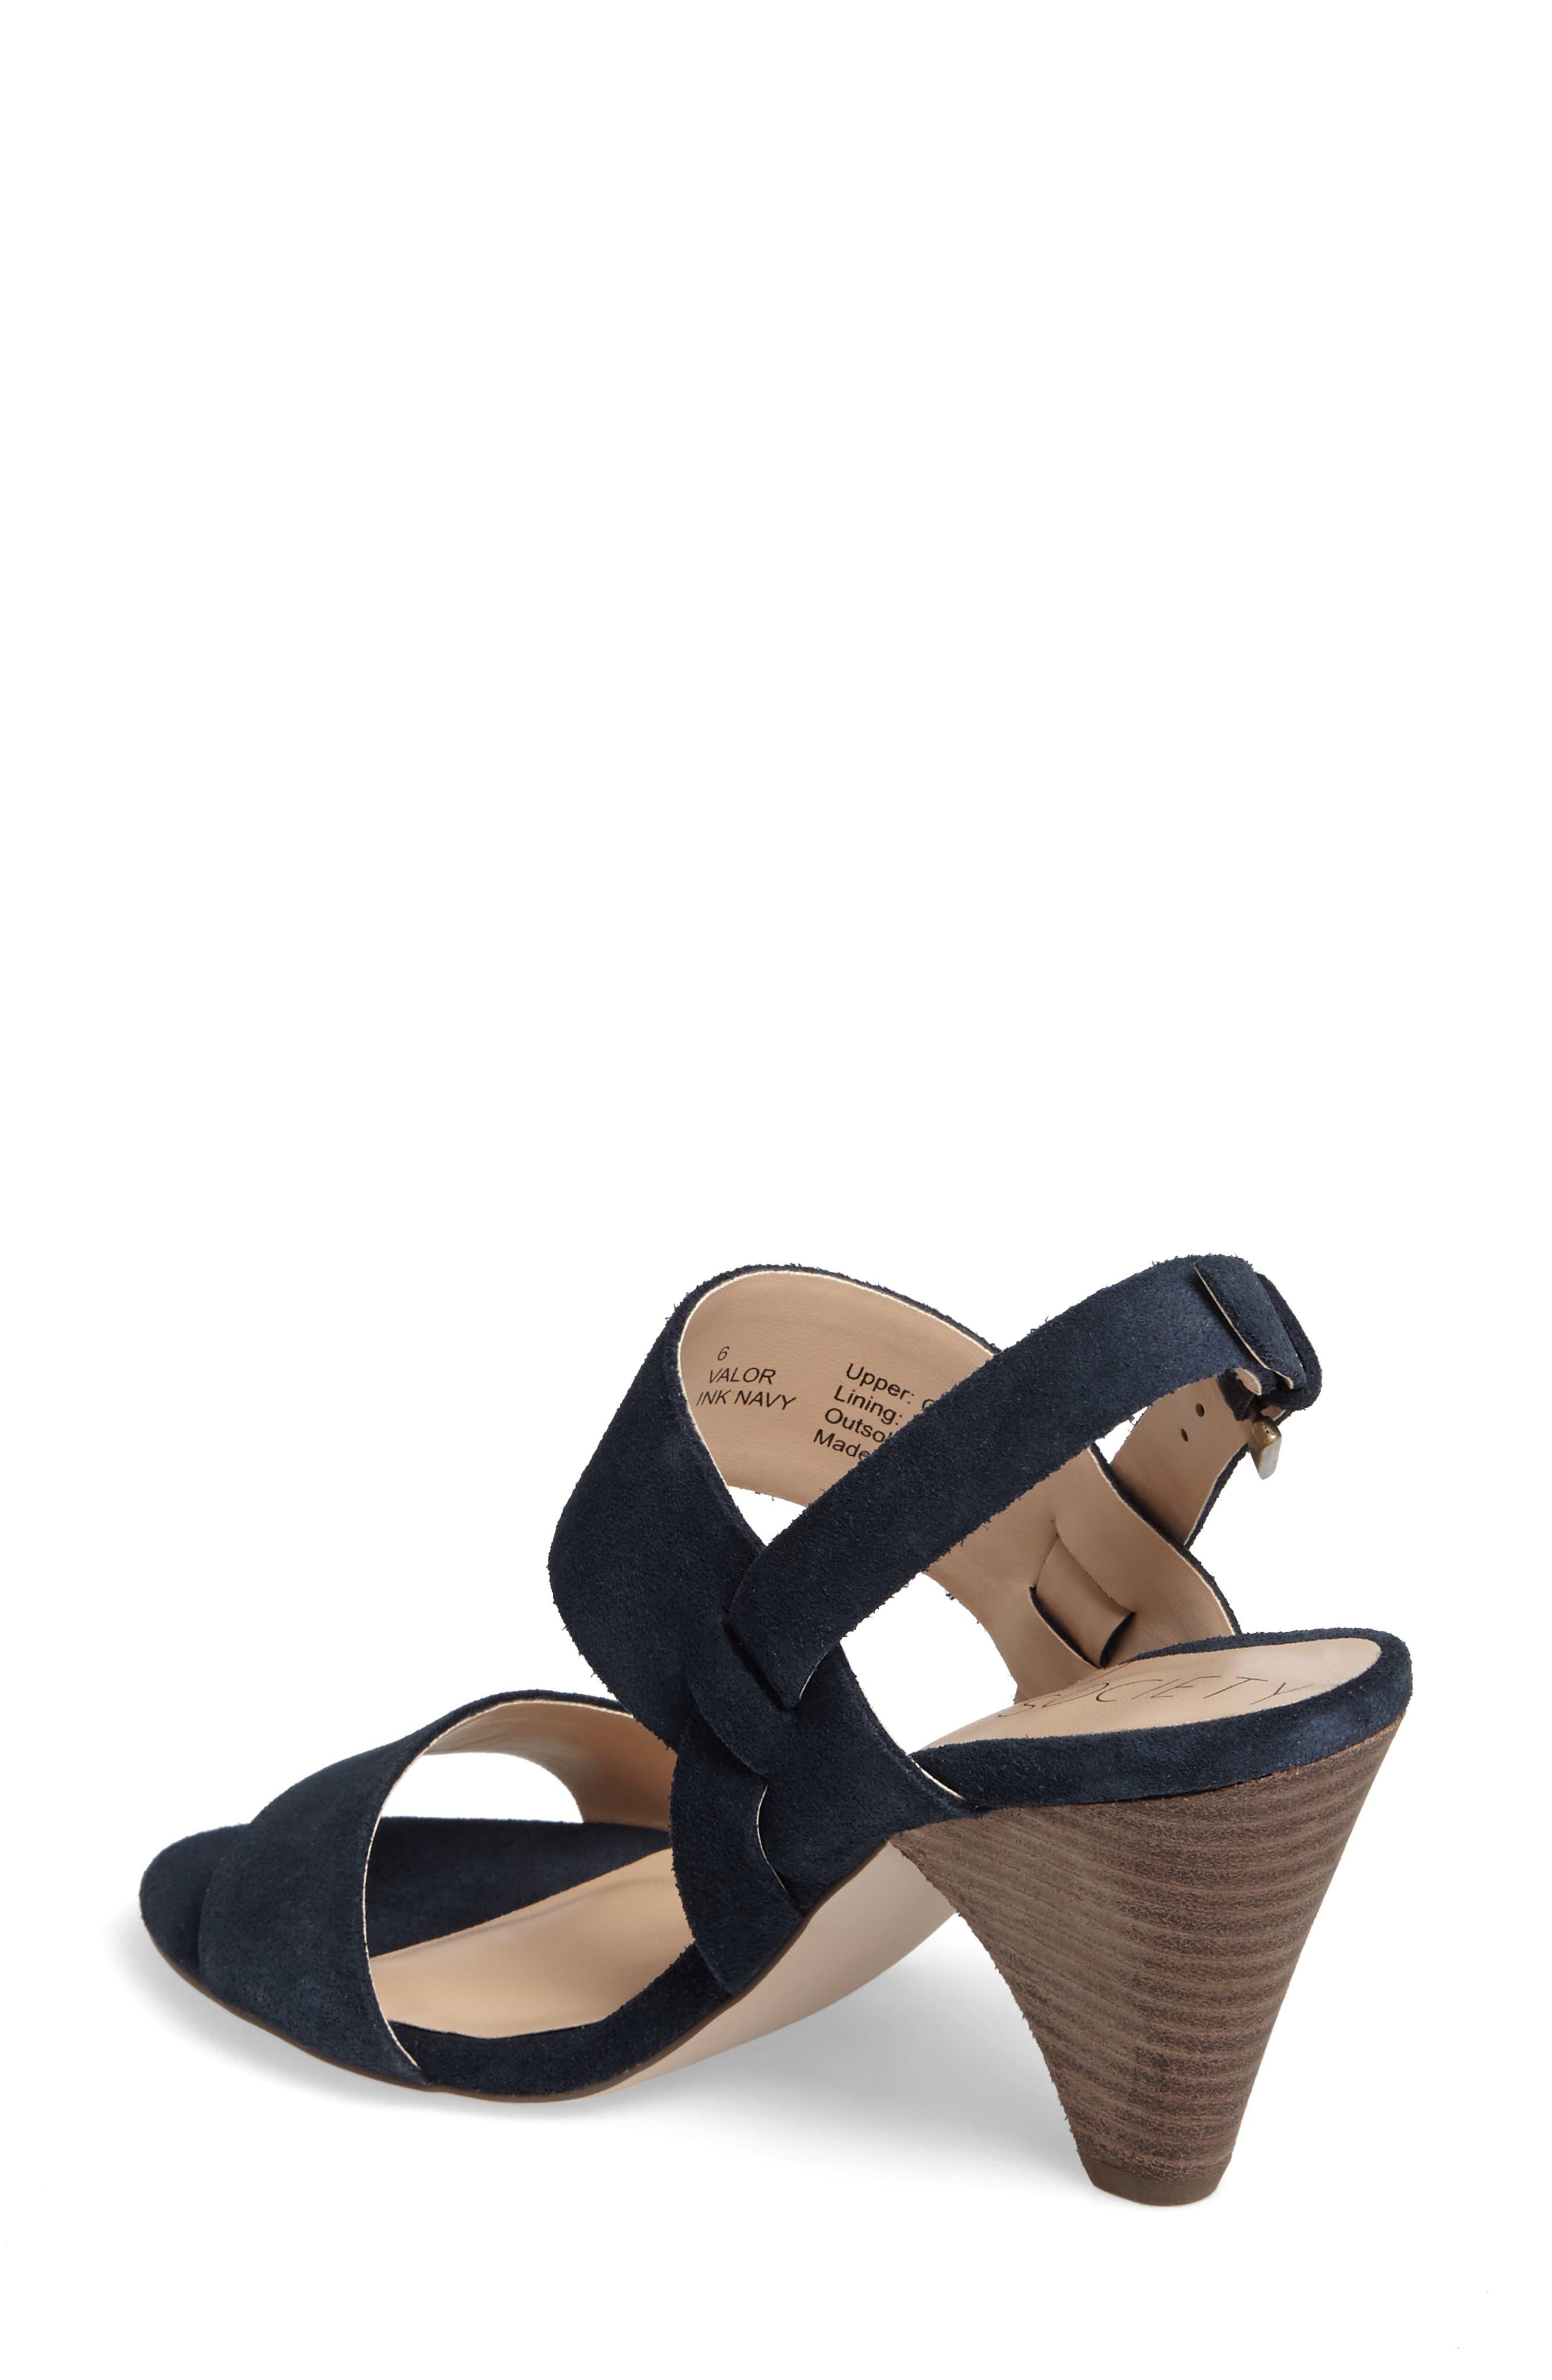 Alternate Image 2  - Sole Society Valor Cone Heel Sandal (Women)